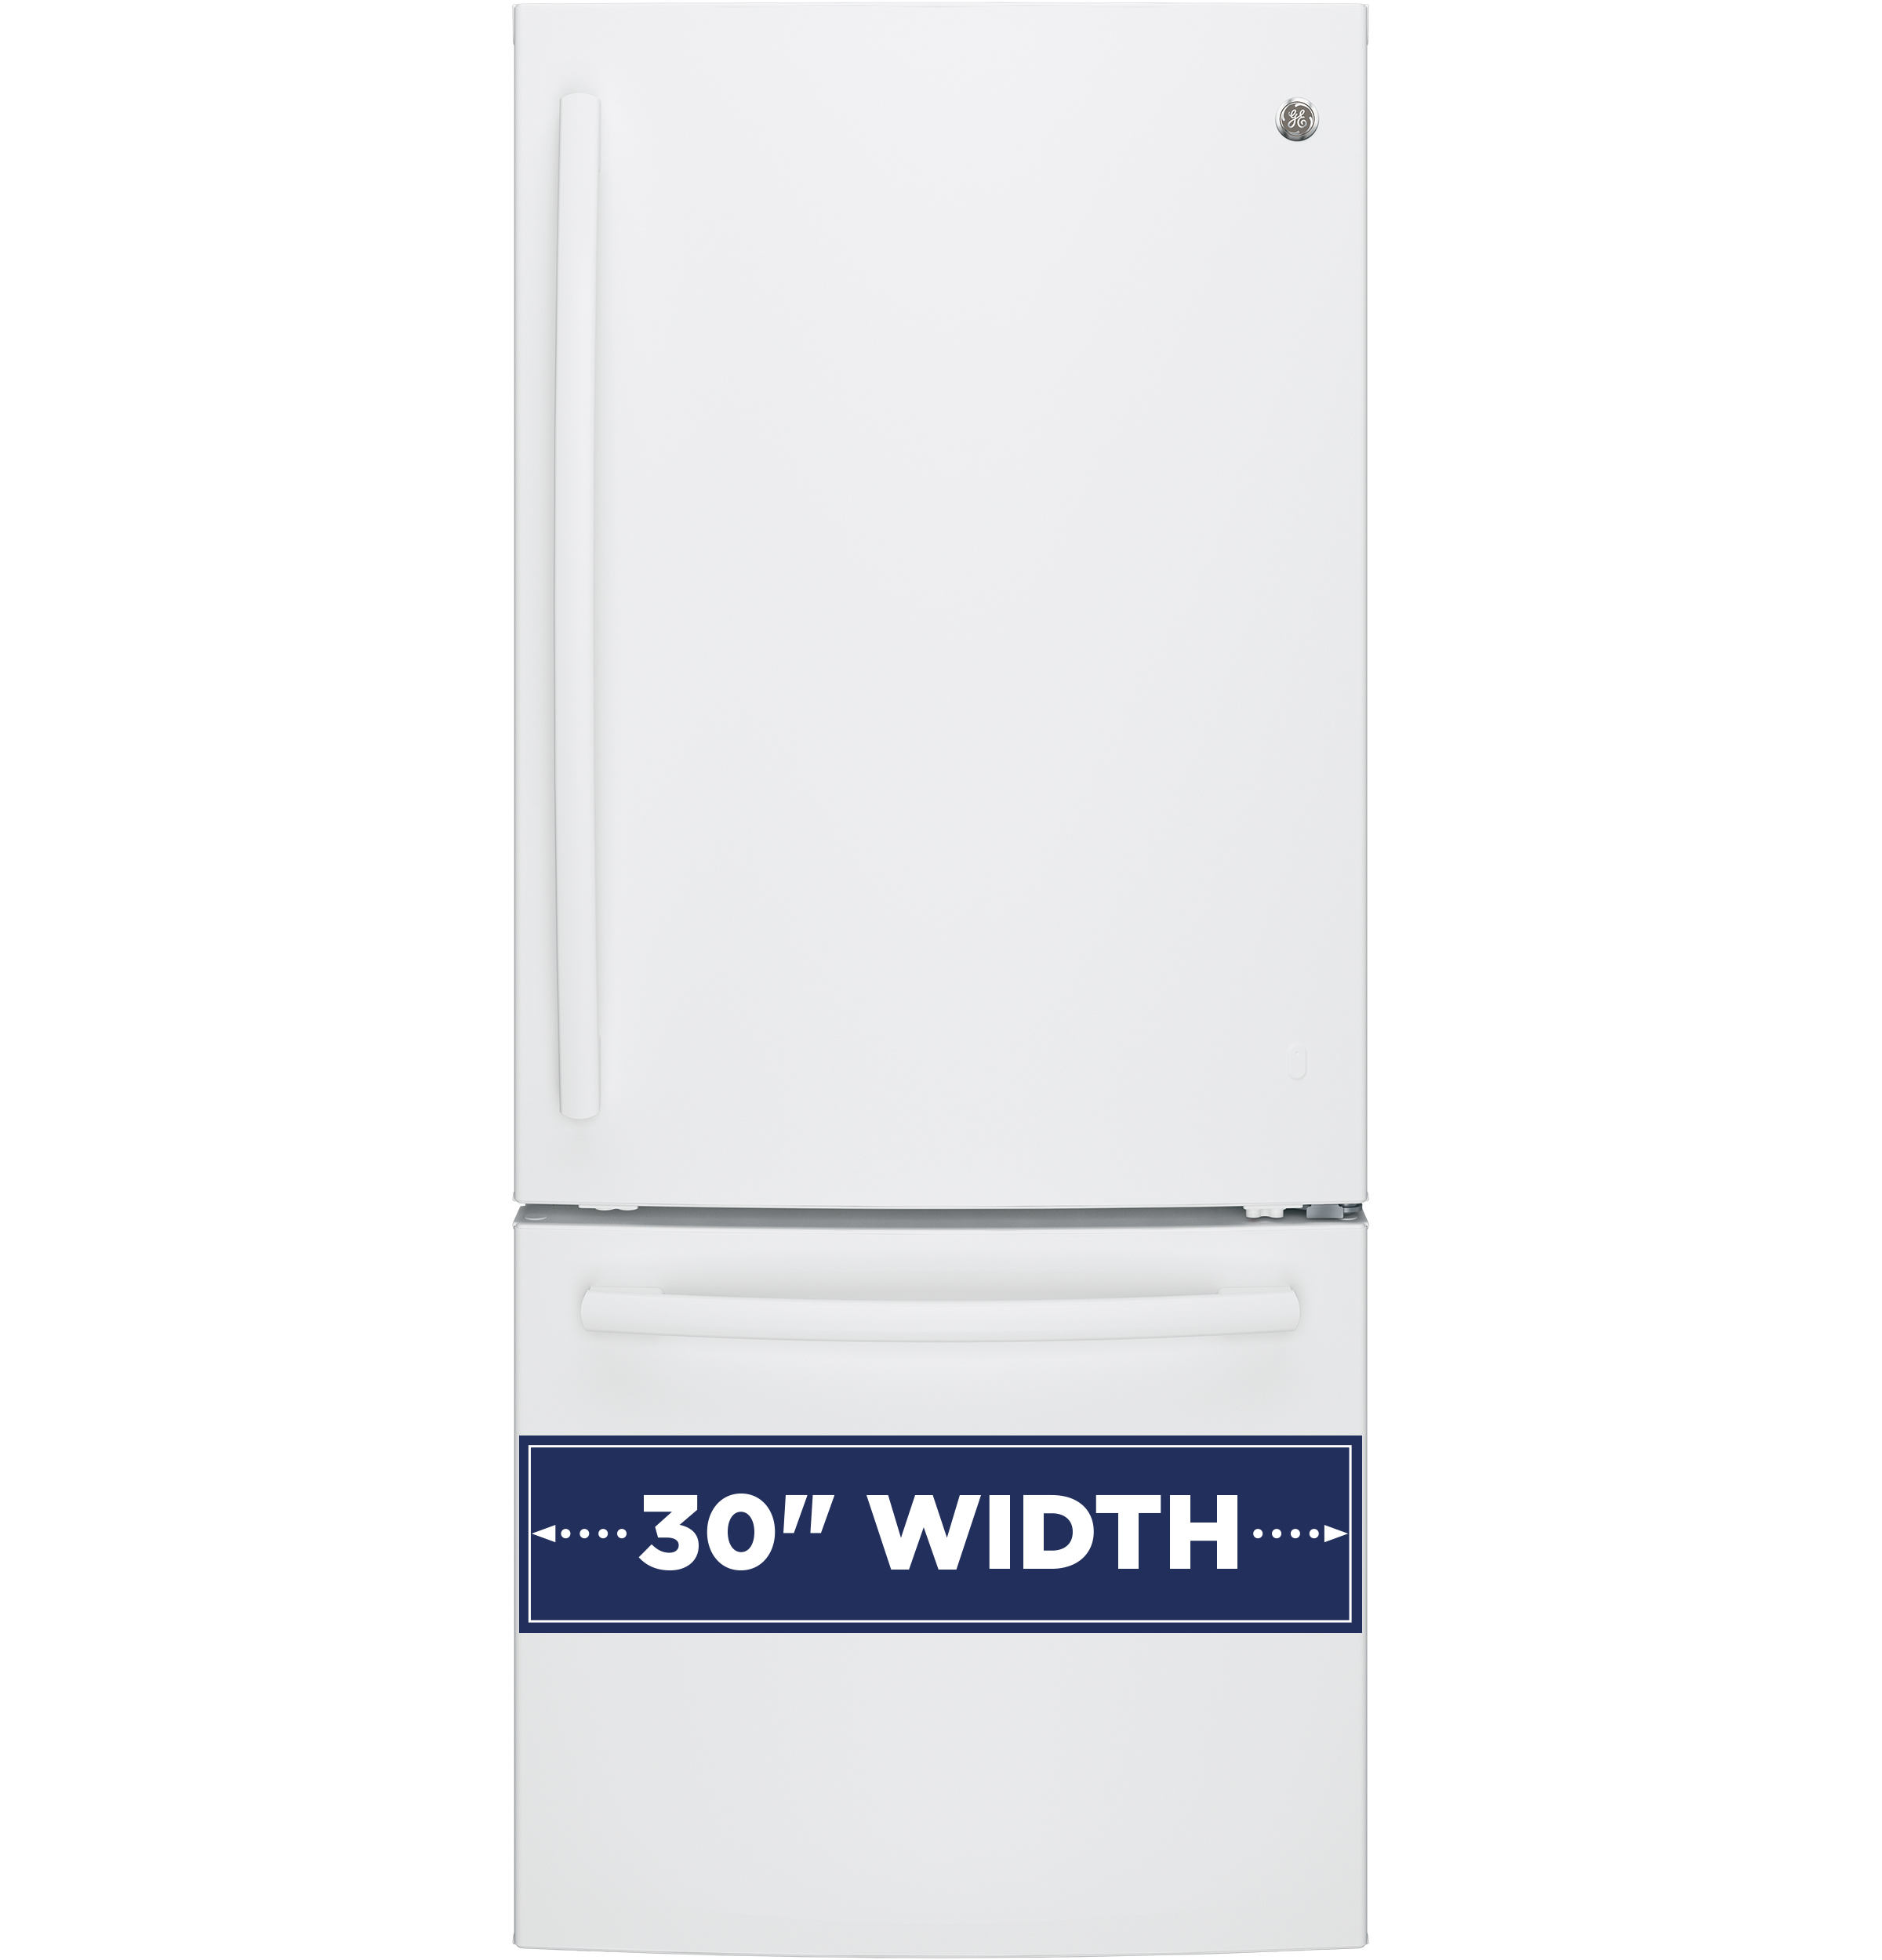 Model: GDE21EGKWW   GE GE® ENERGY STAR® 21.0 Cu. Ft. Bottom-Freezer Refrigerator